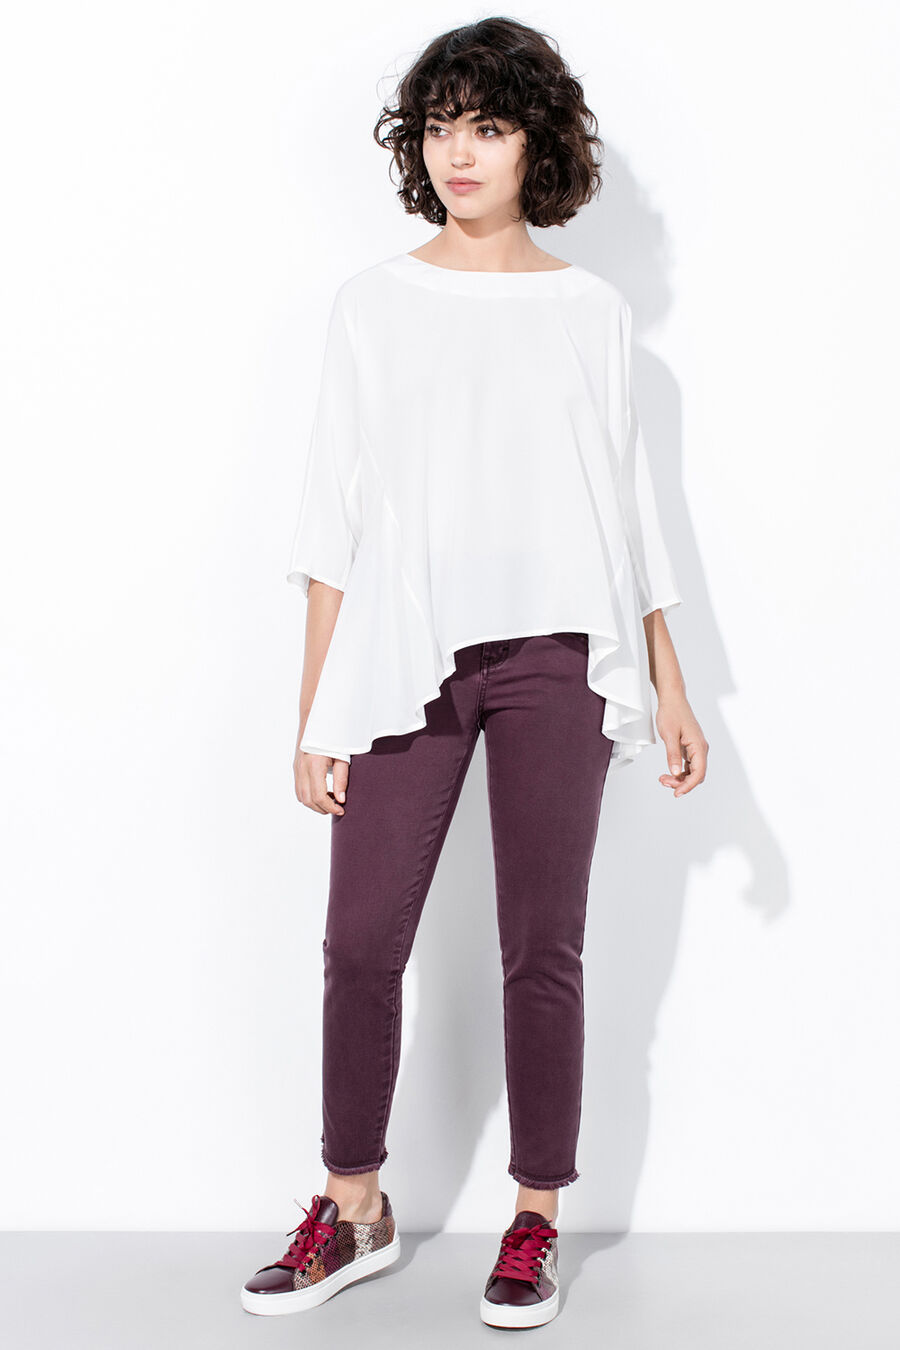 Cuts blouse